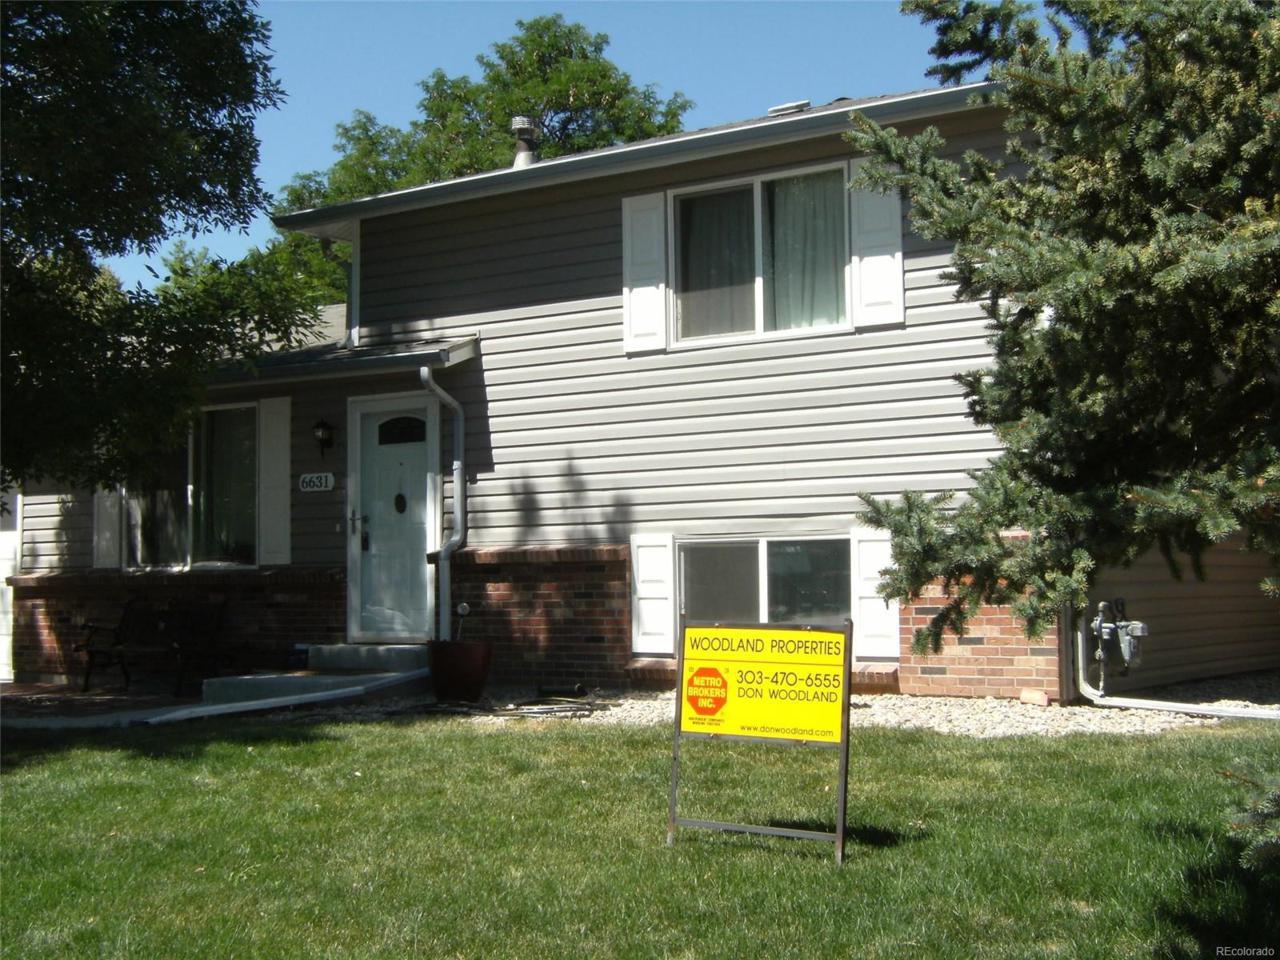 6631 S Dudley Court, Littleton, CO 80123 (MLS #6925055) :: 8z Real Estate